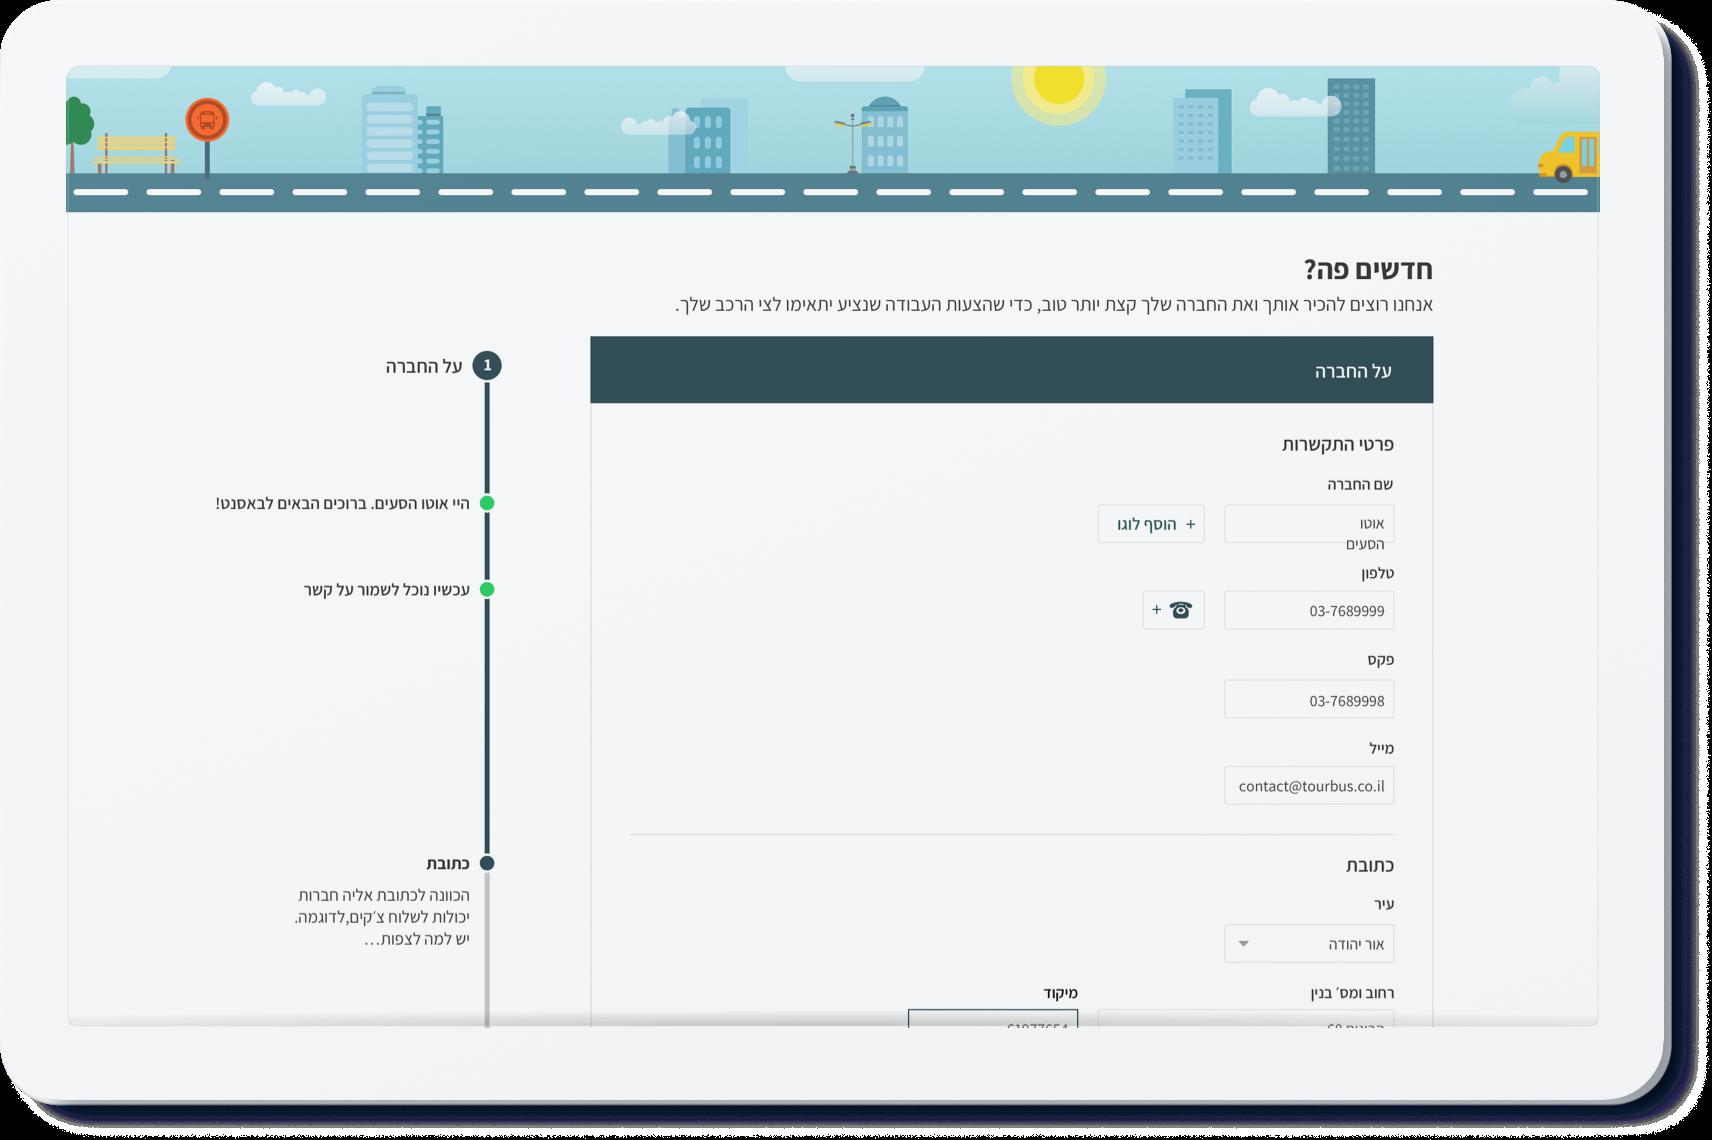 Trucknet registration process